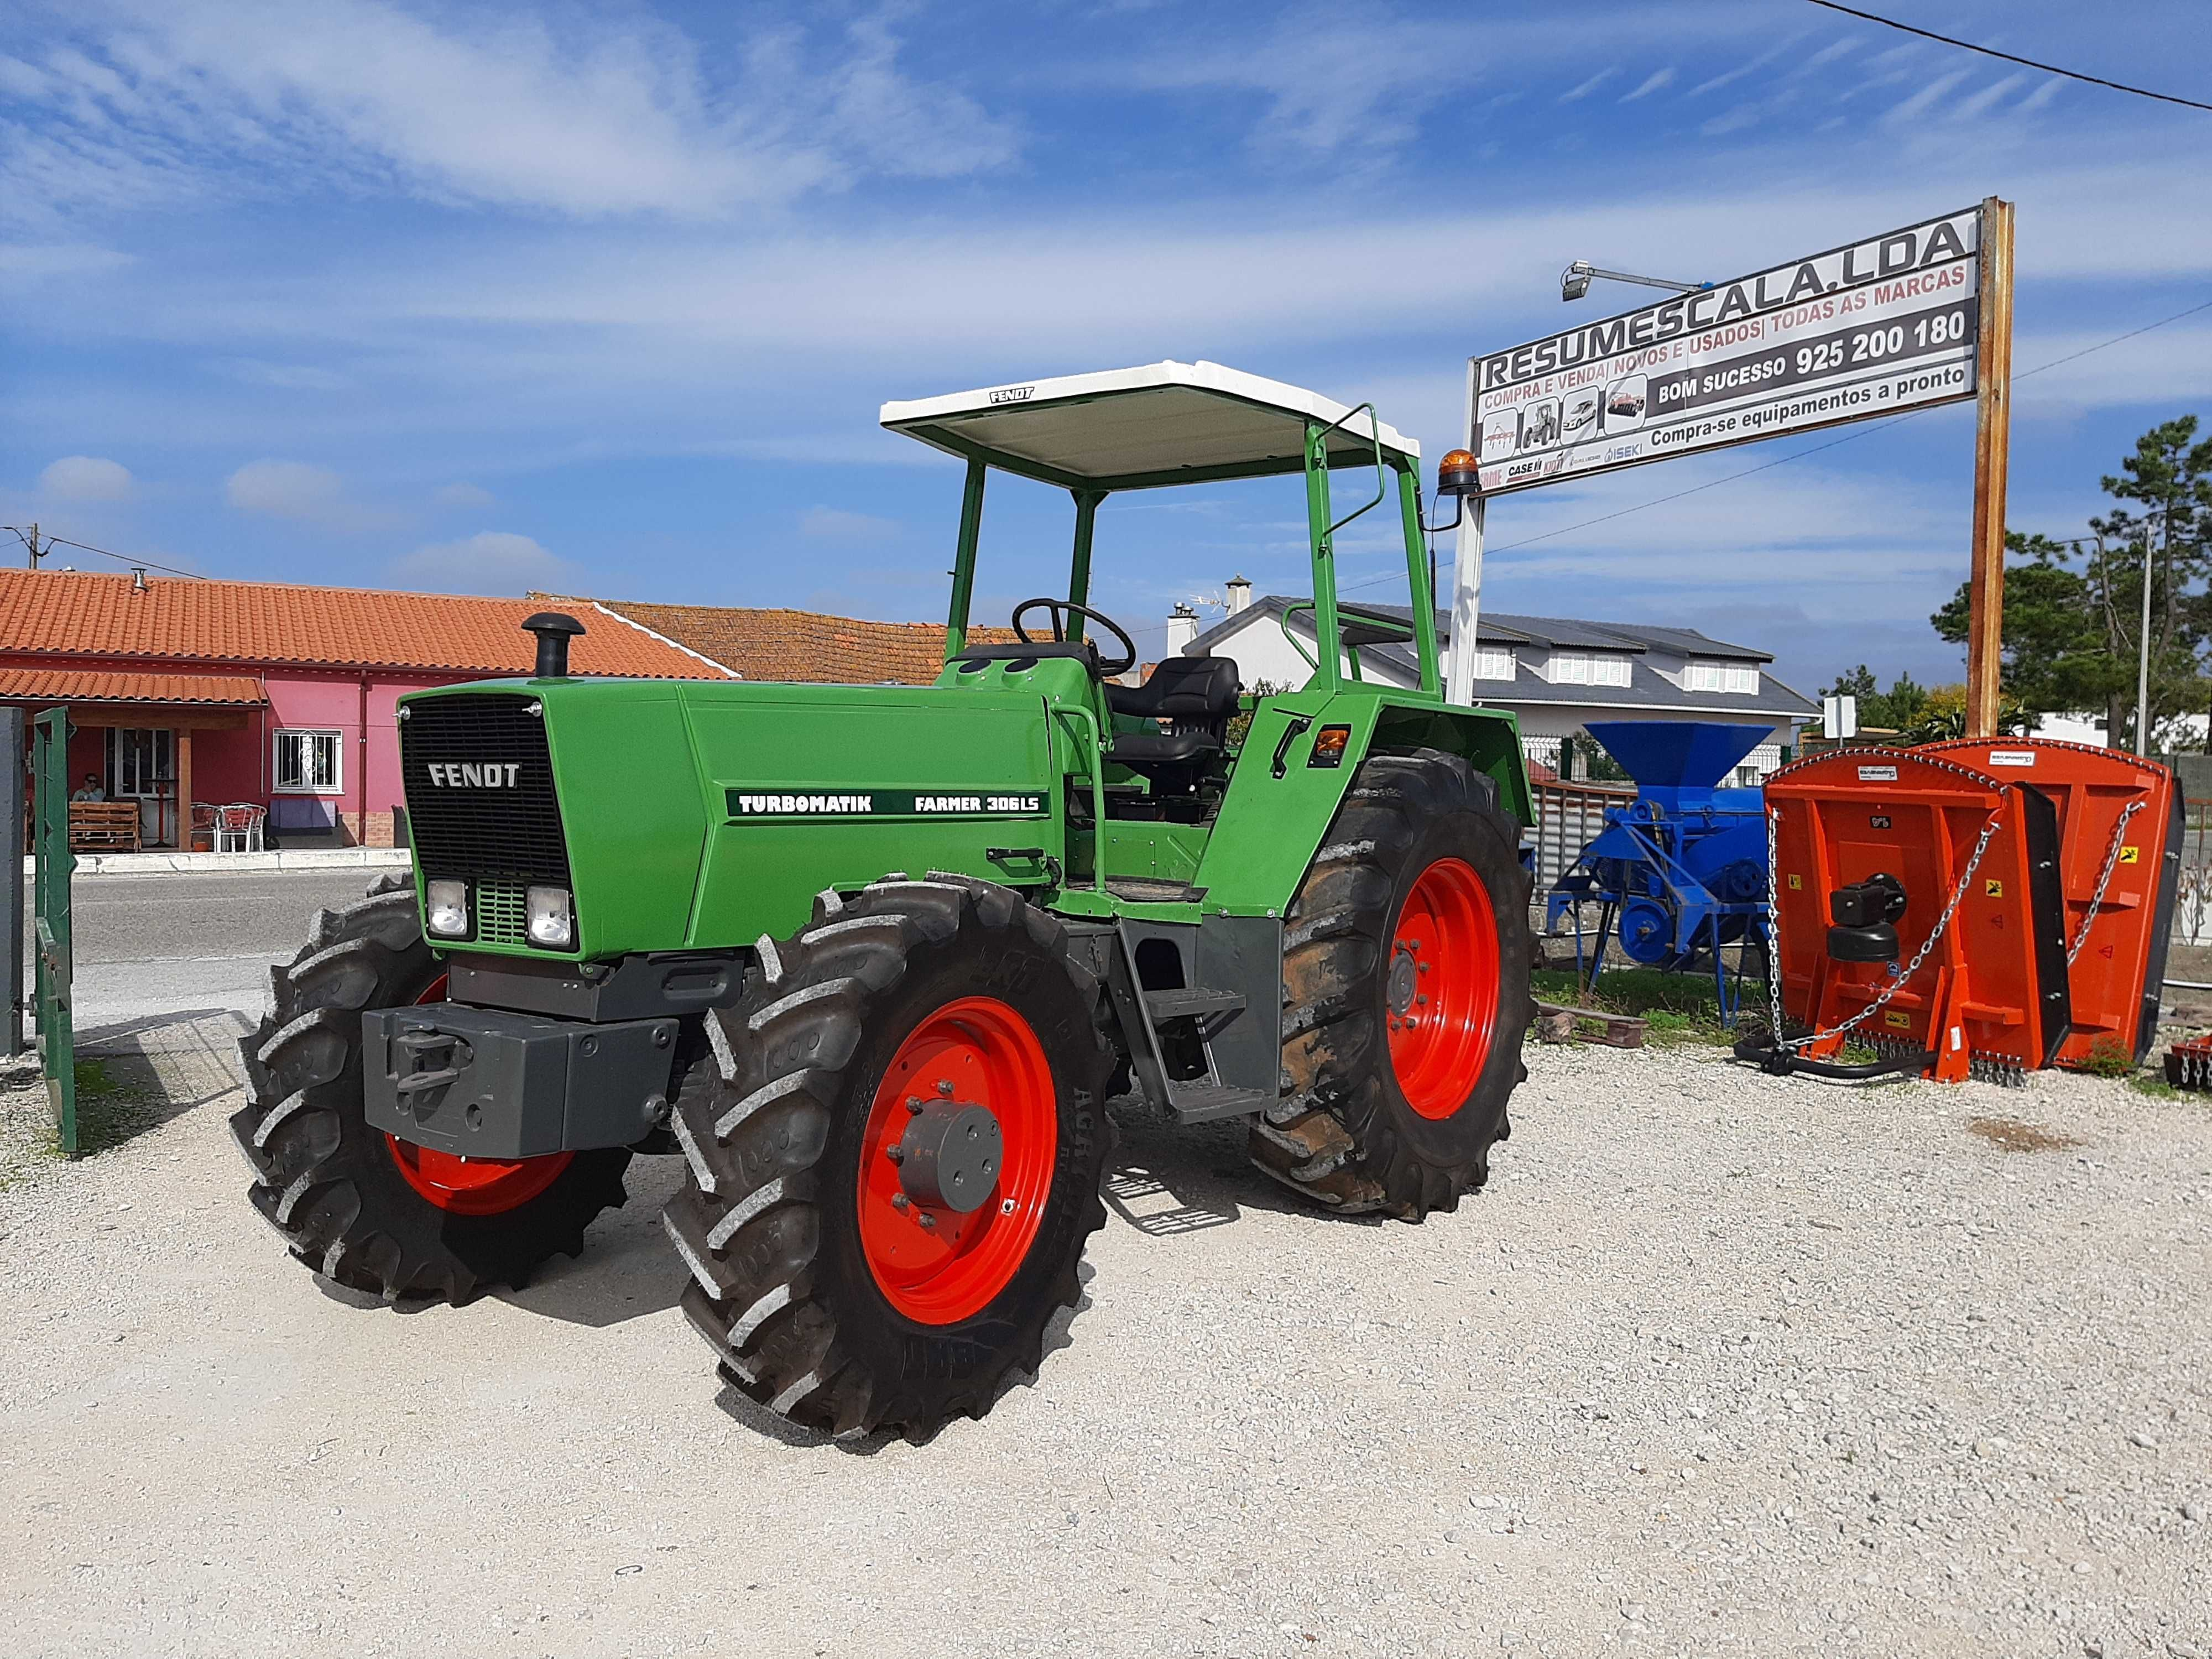 Tractor/Trator Fendt Farmer 306 LSA